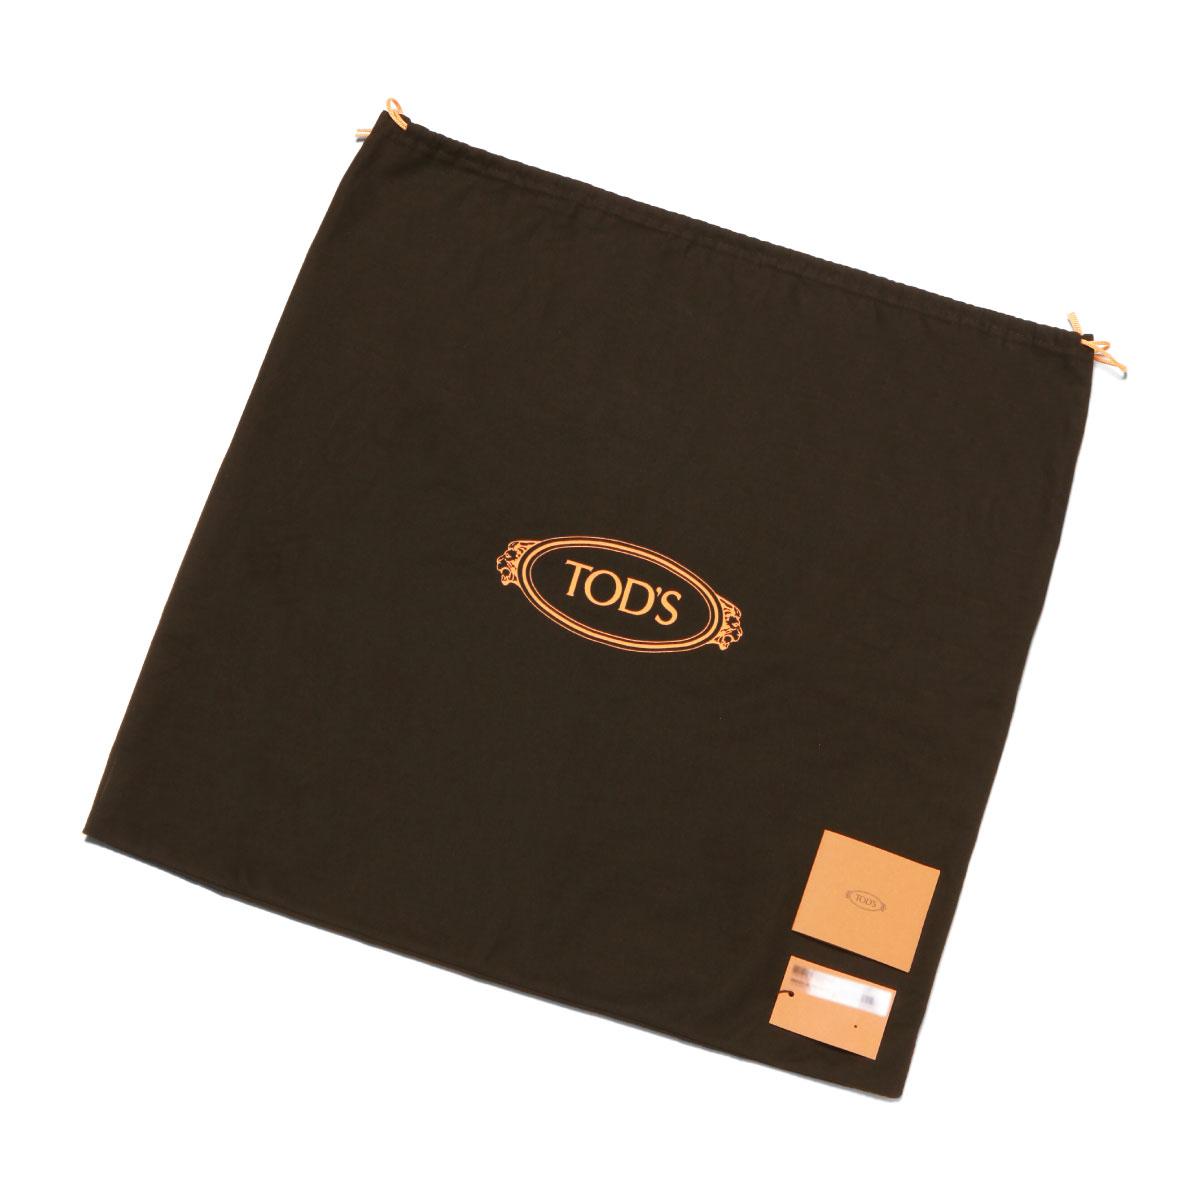 TODS トッズ | トートバッグ ミディアム | SHOPPING ショッピング